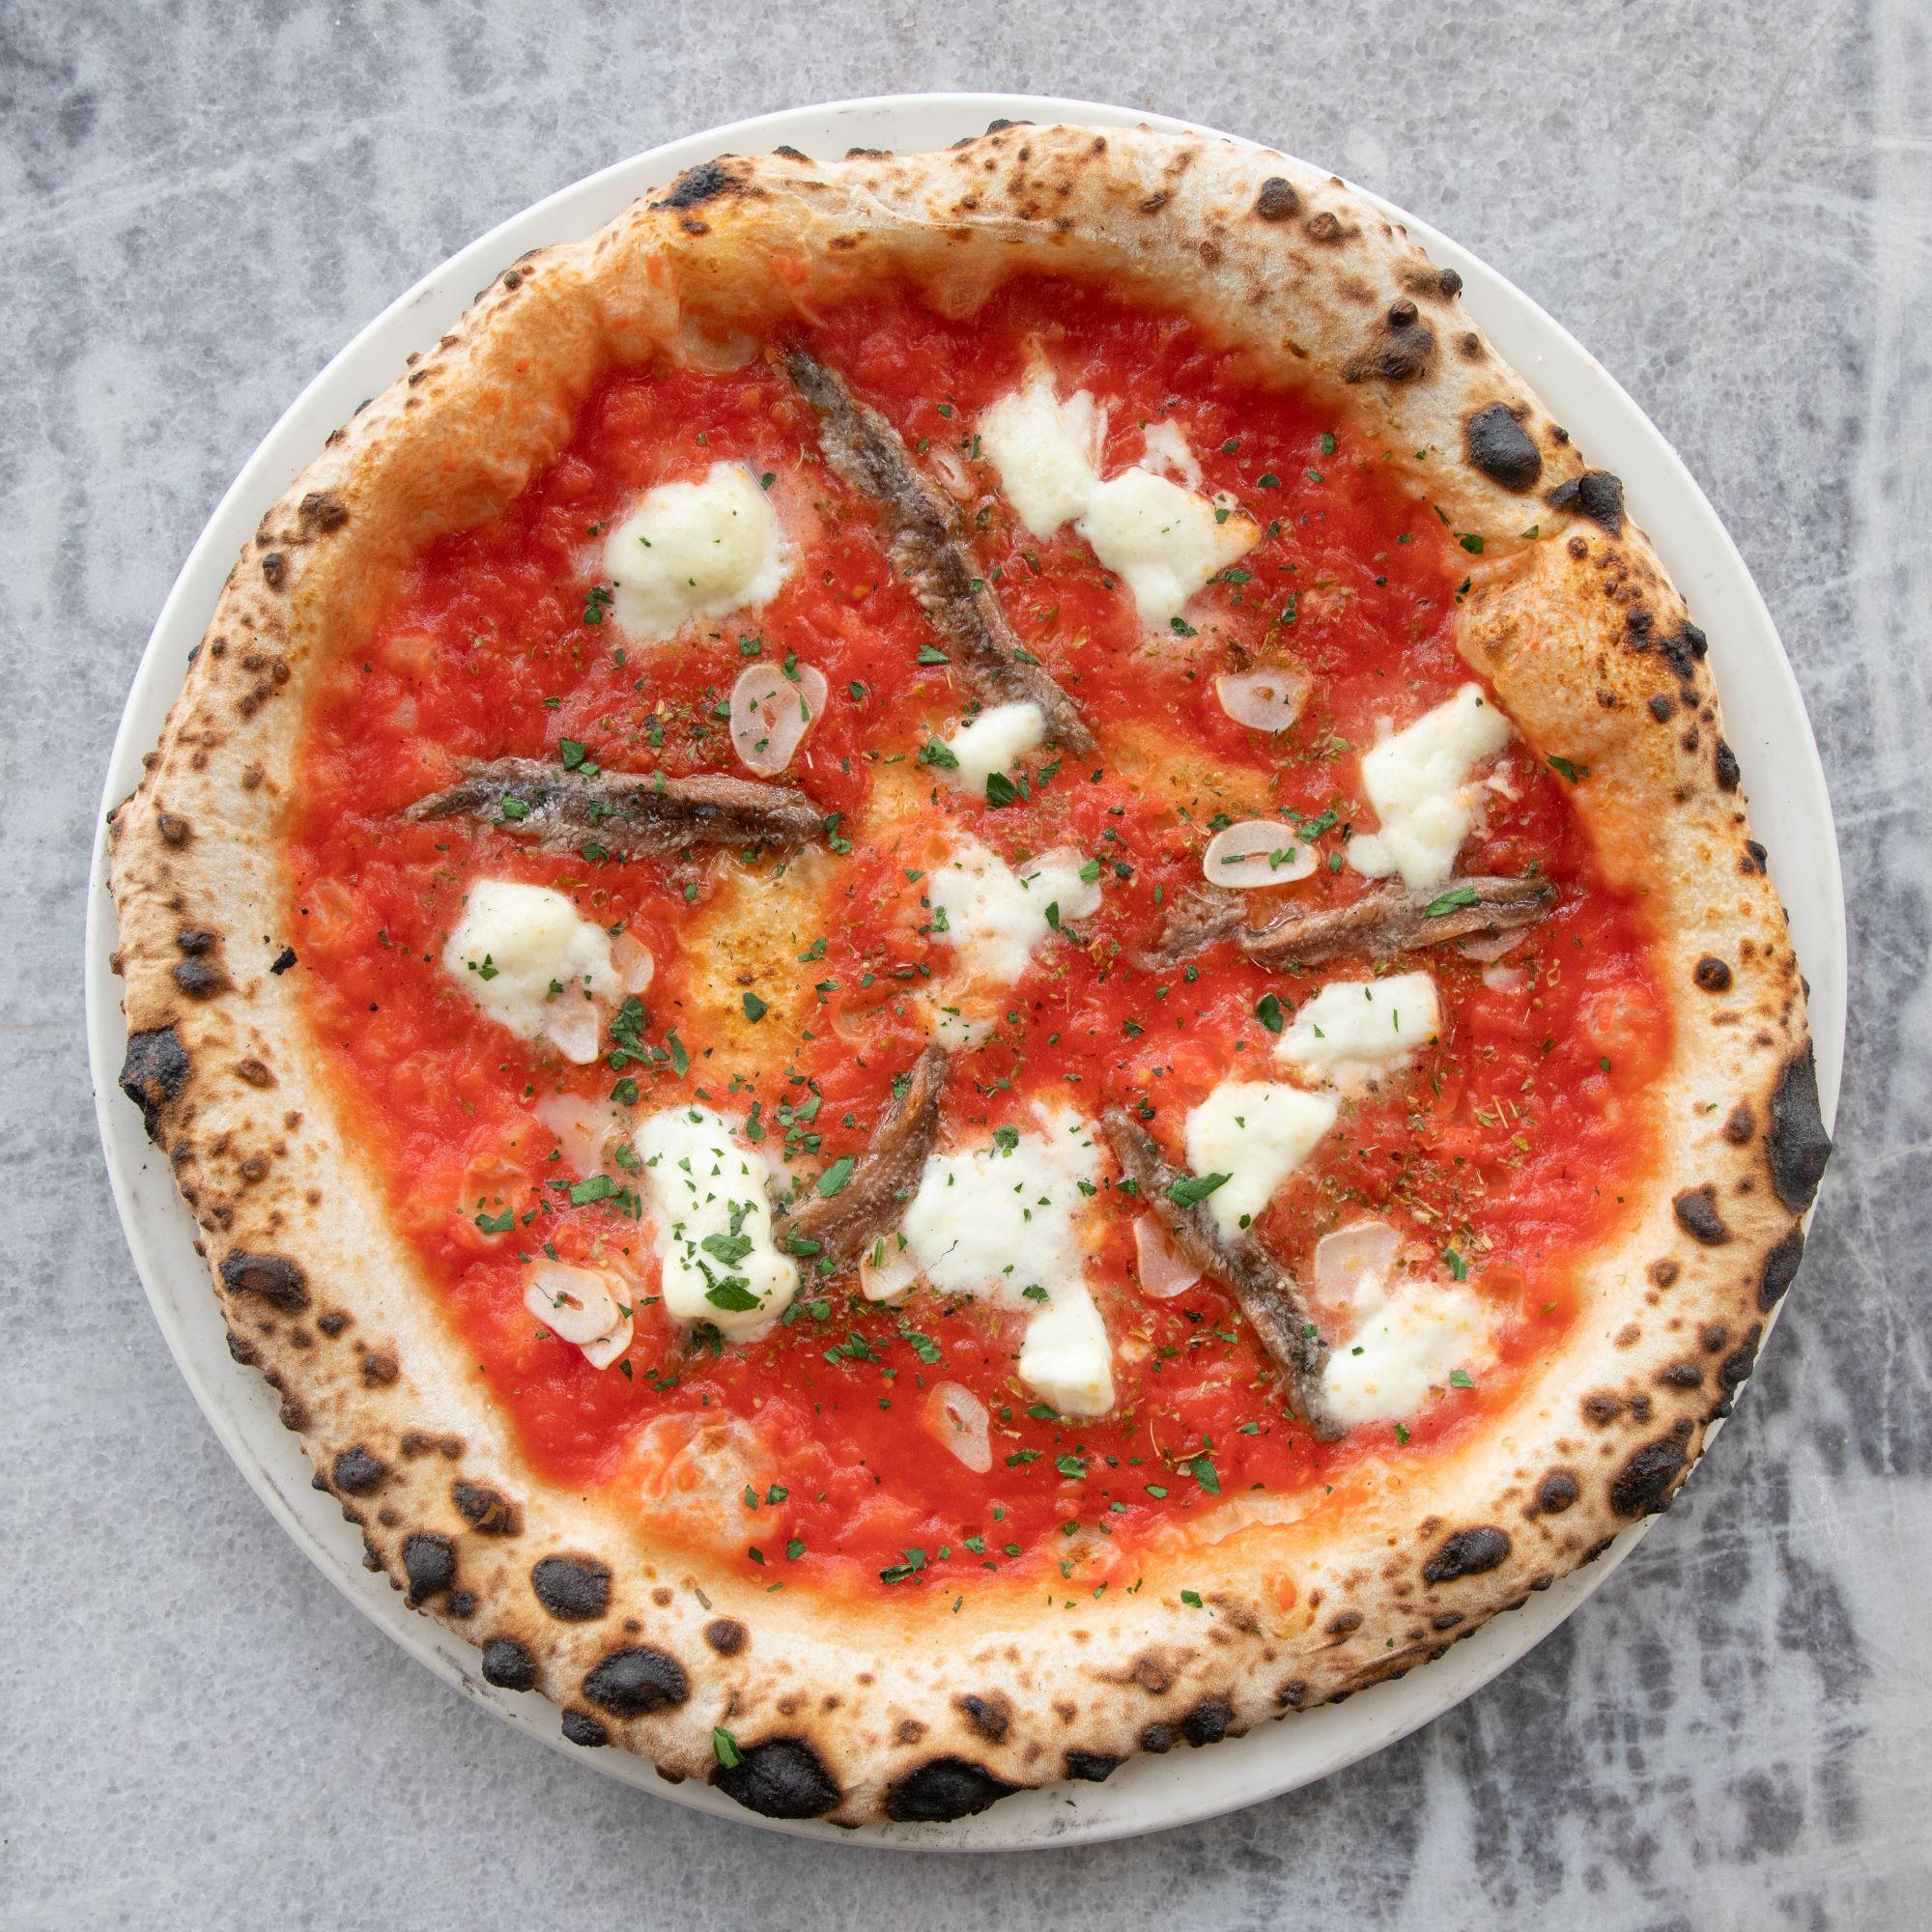 pomodoro, buffalo mozzarella DOP, oregano, garlic, anchovies, Italian parsley